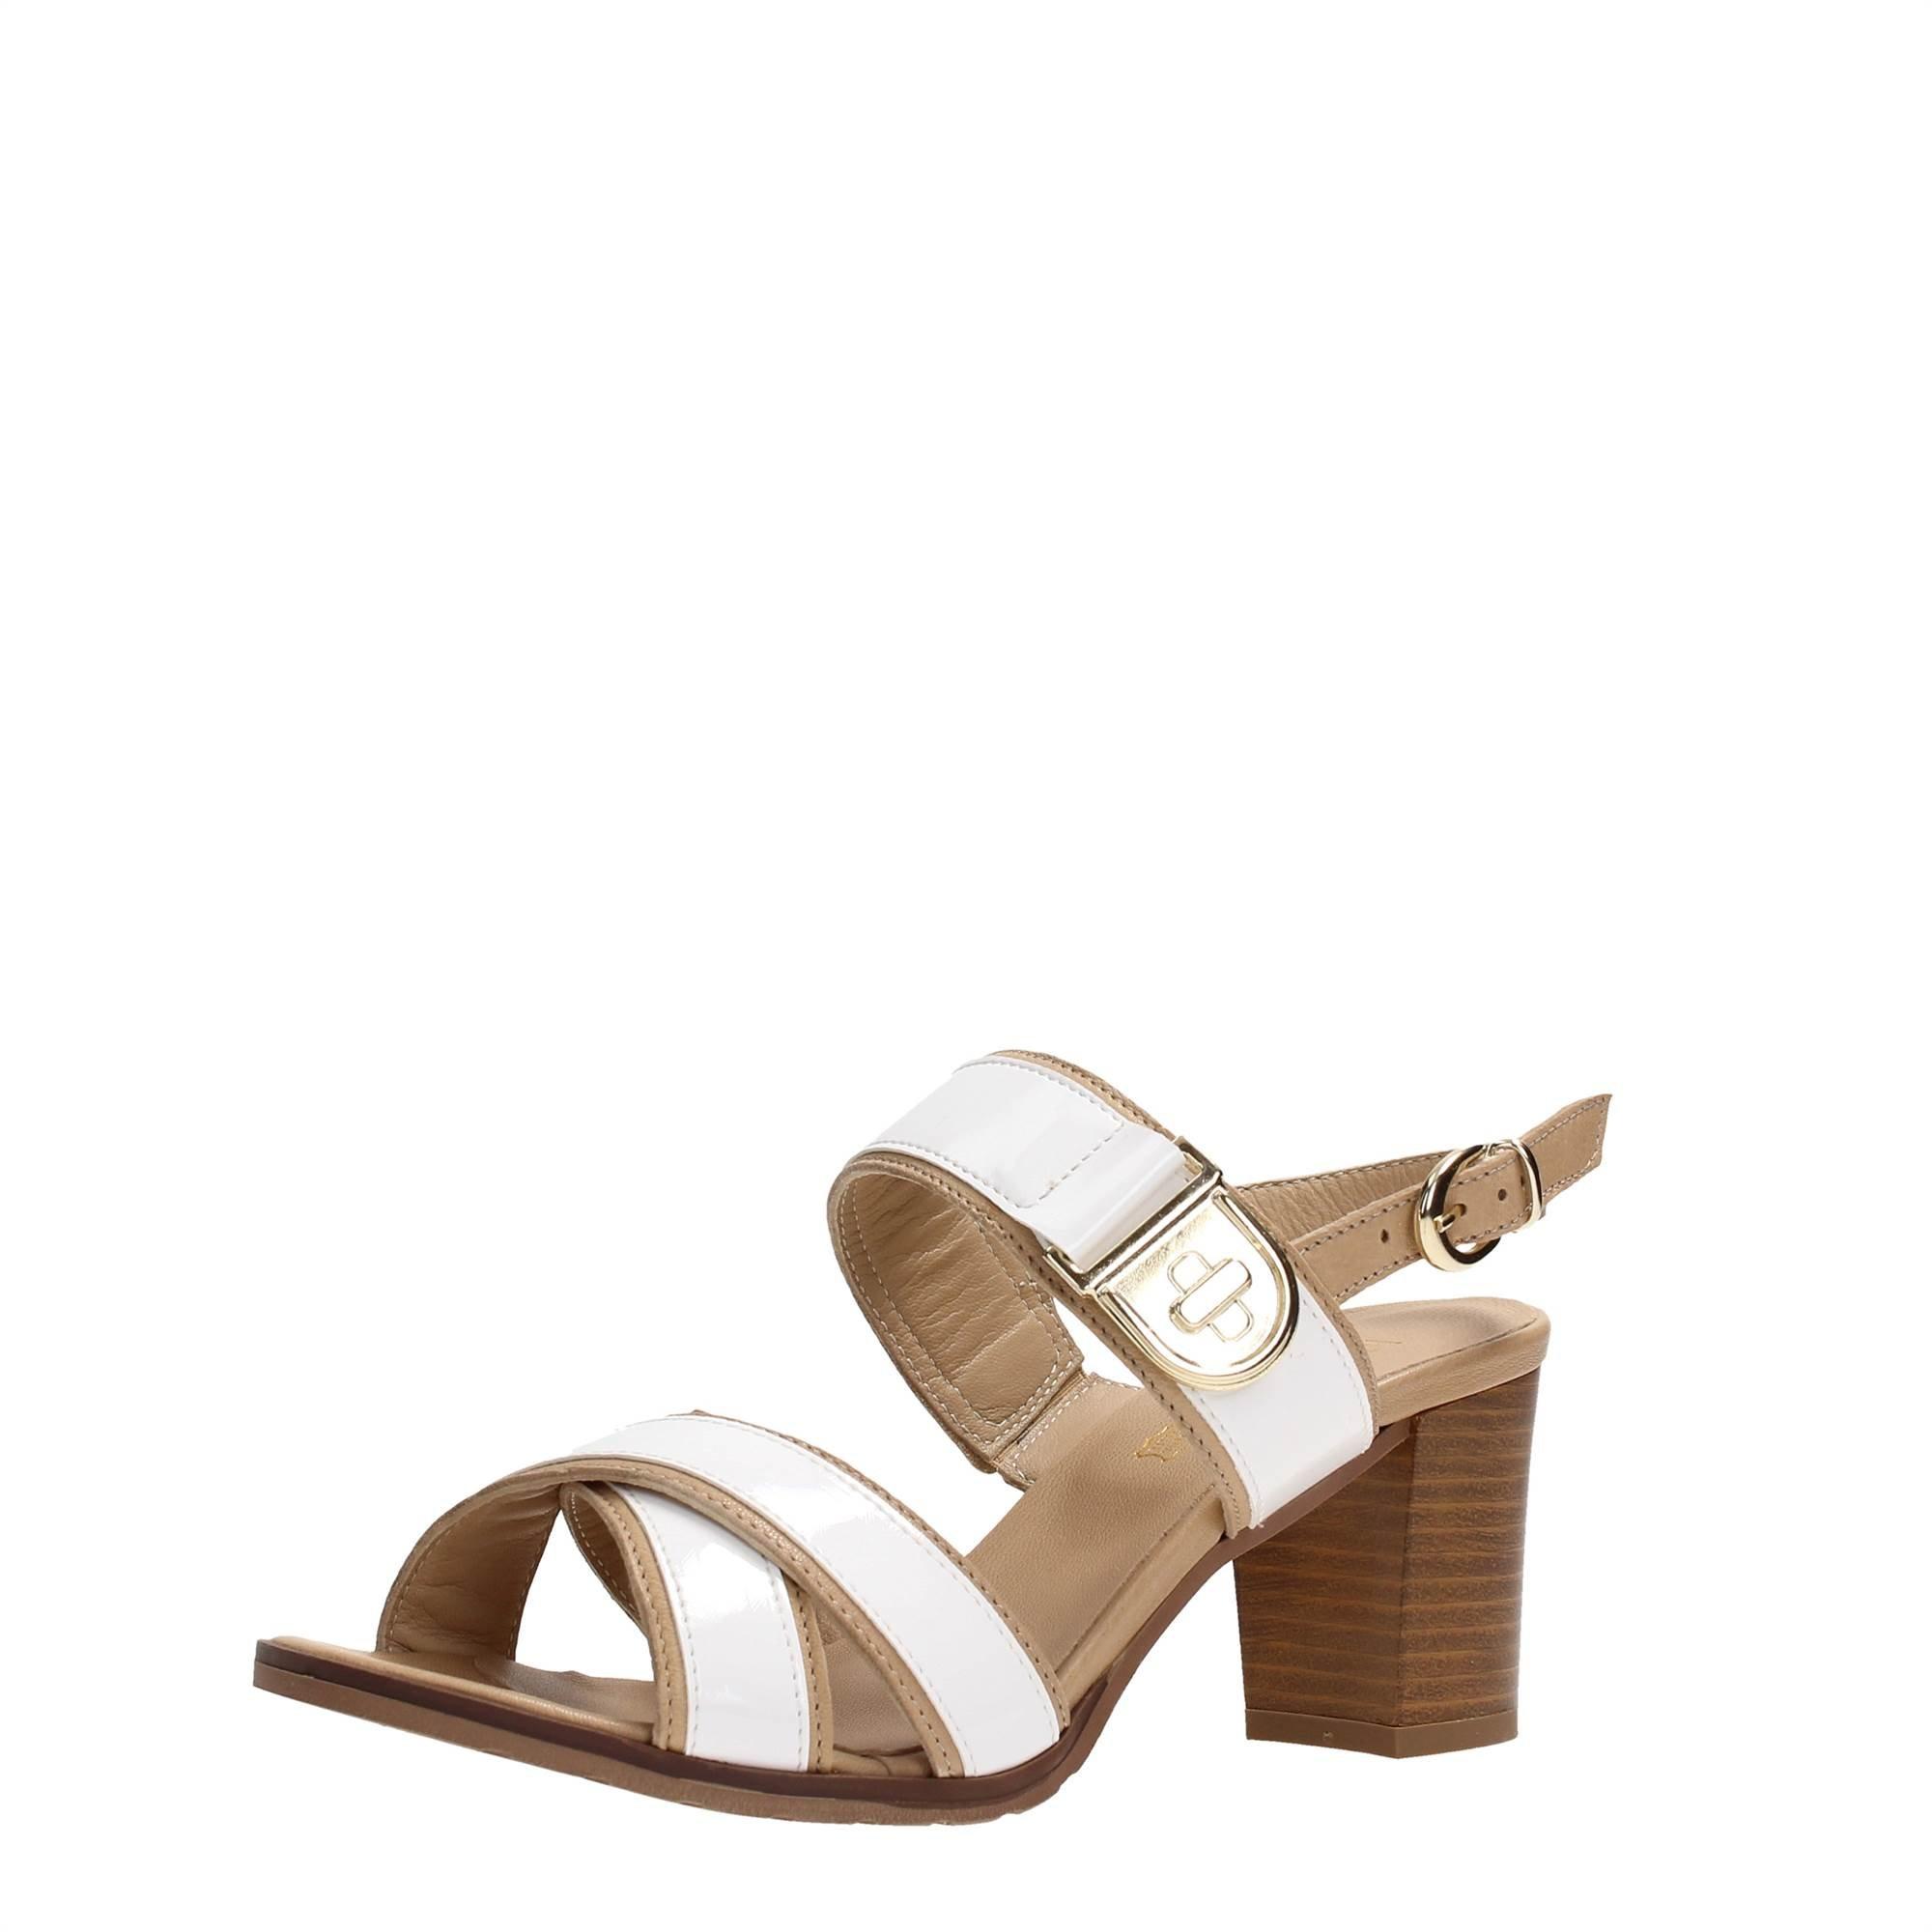 4567 E Olmi Heel Art Con Igi Florence Rignano Sandalwood Calzado Co ED9WH2IY